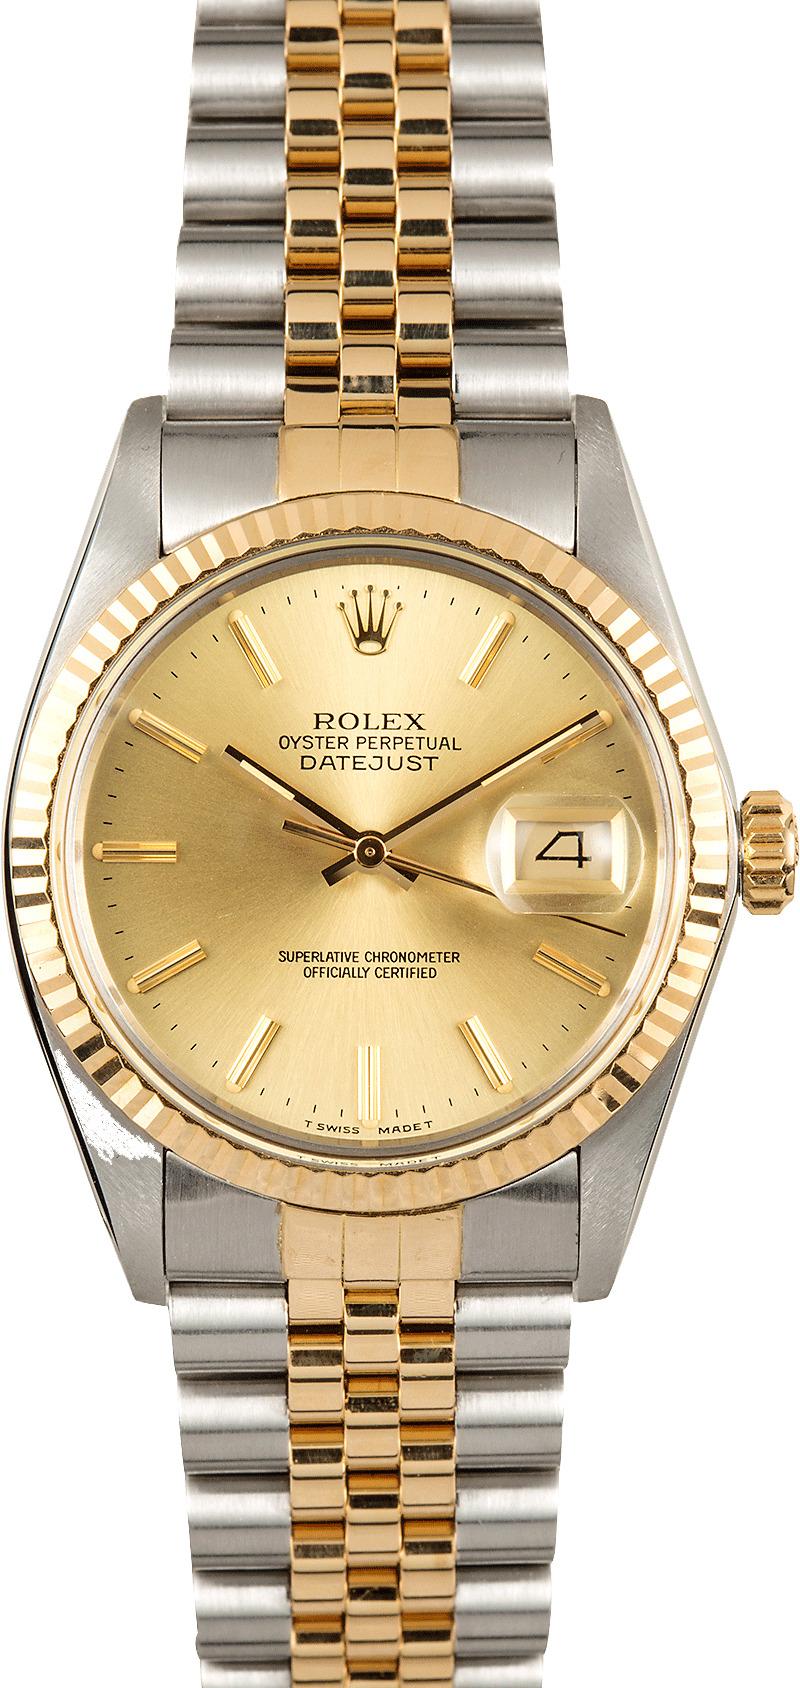 Used Rolex Daytona >> Rolex Datejust 16013 Men's Watch